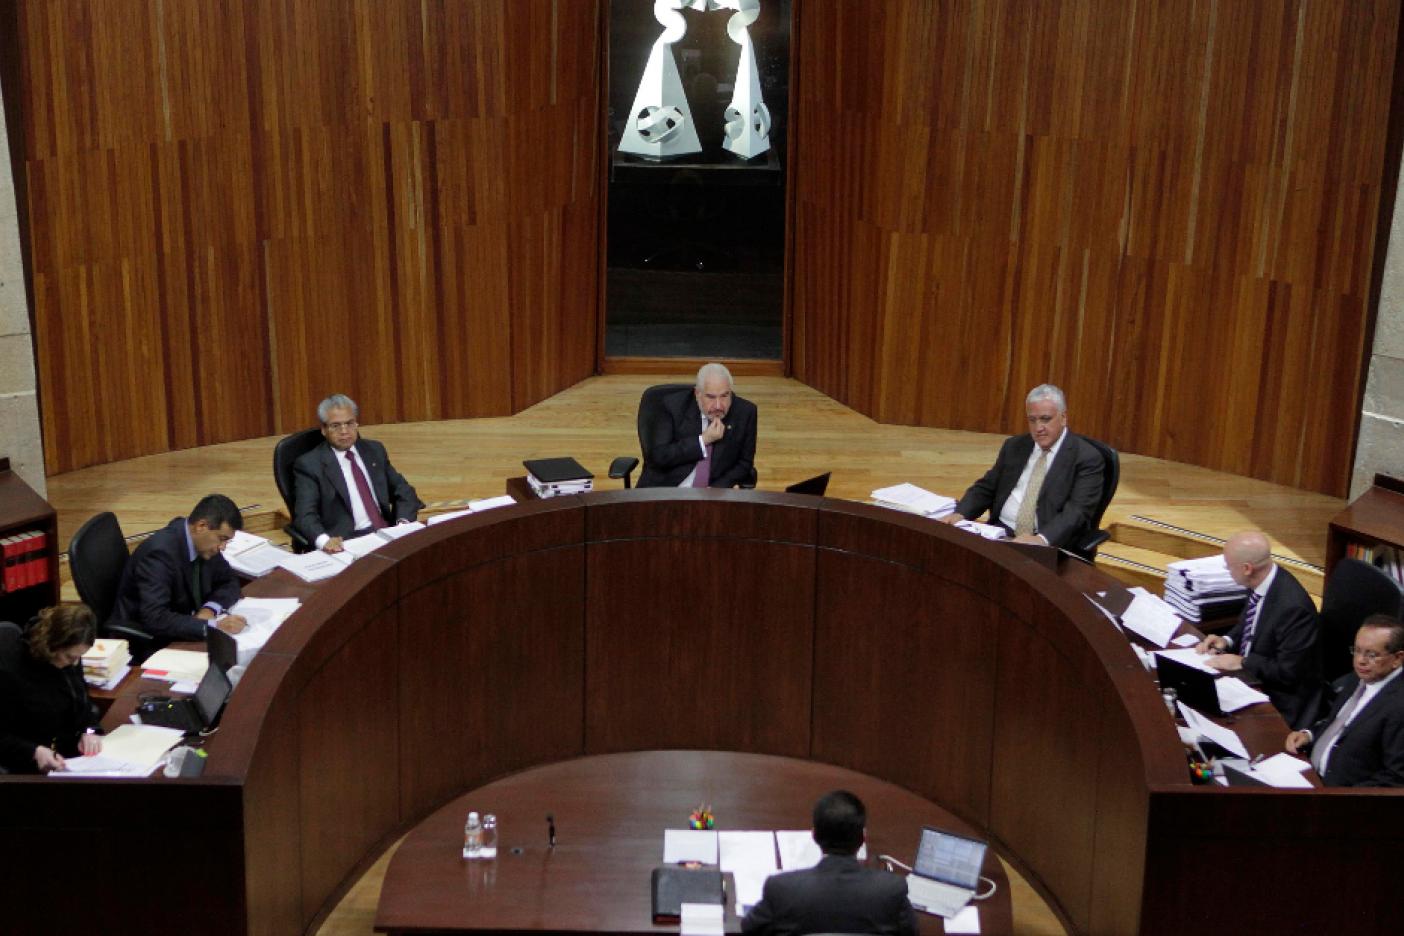 Tribunal tira cancha pareja para promoción de funcionarios públicos